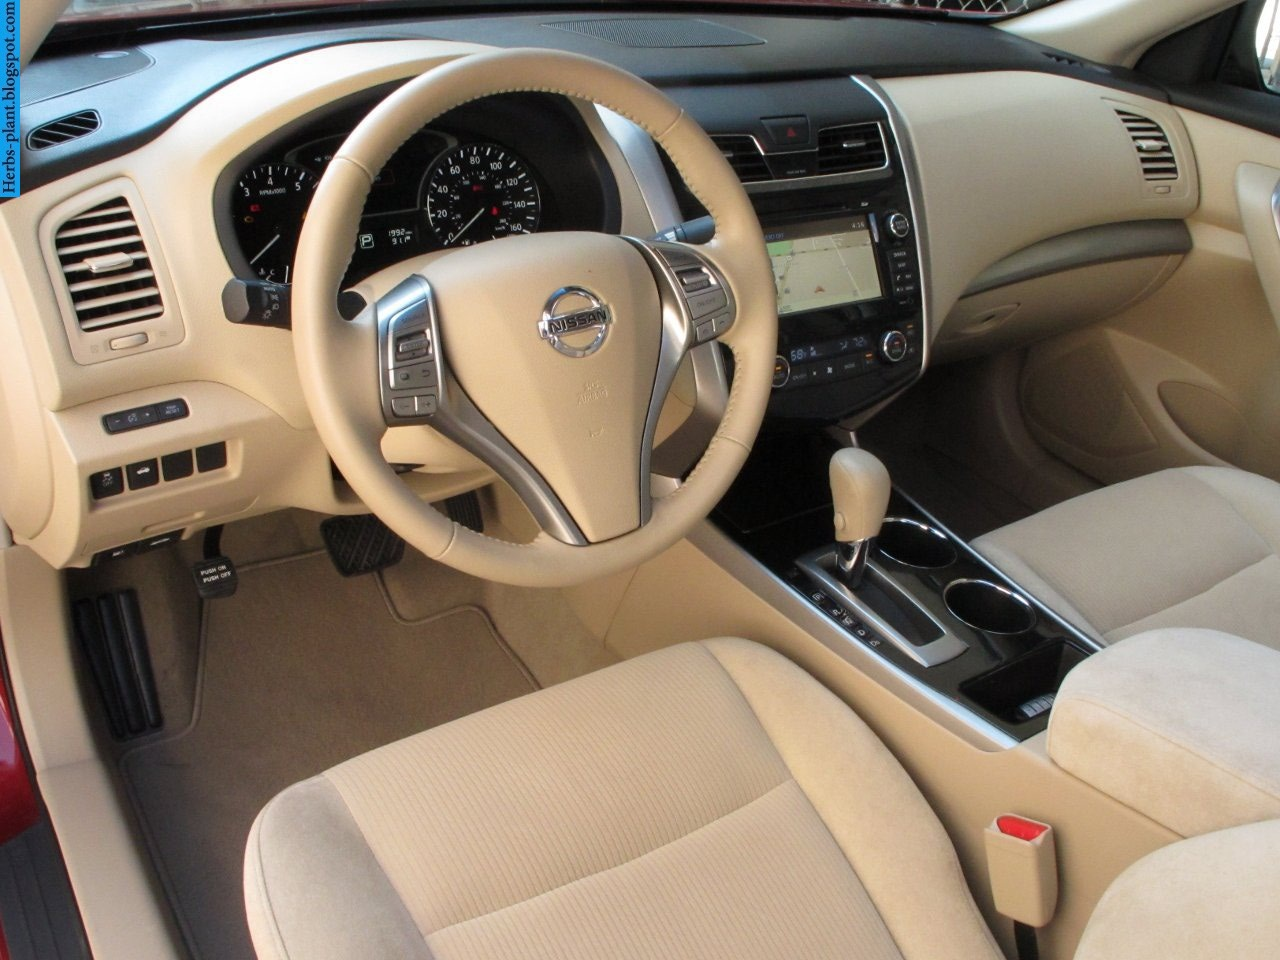 Nissan altima car 2013 interior - صور سيارة نيسان التيما 2013 من الداخل